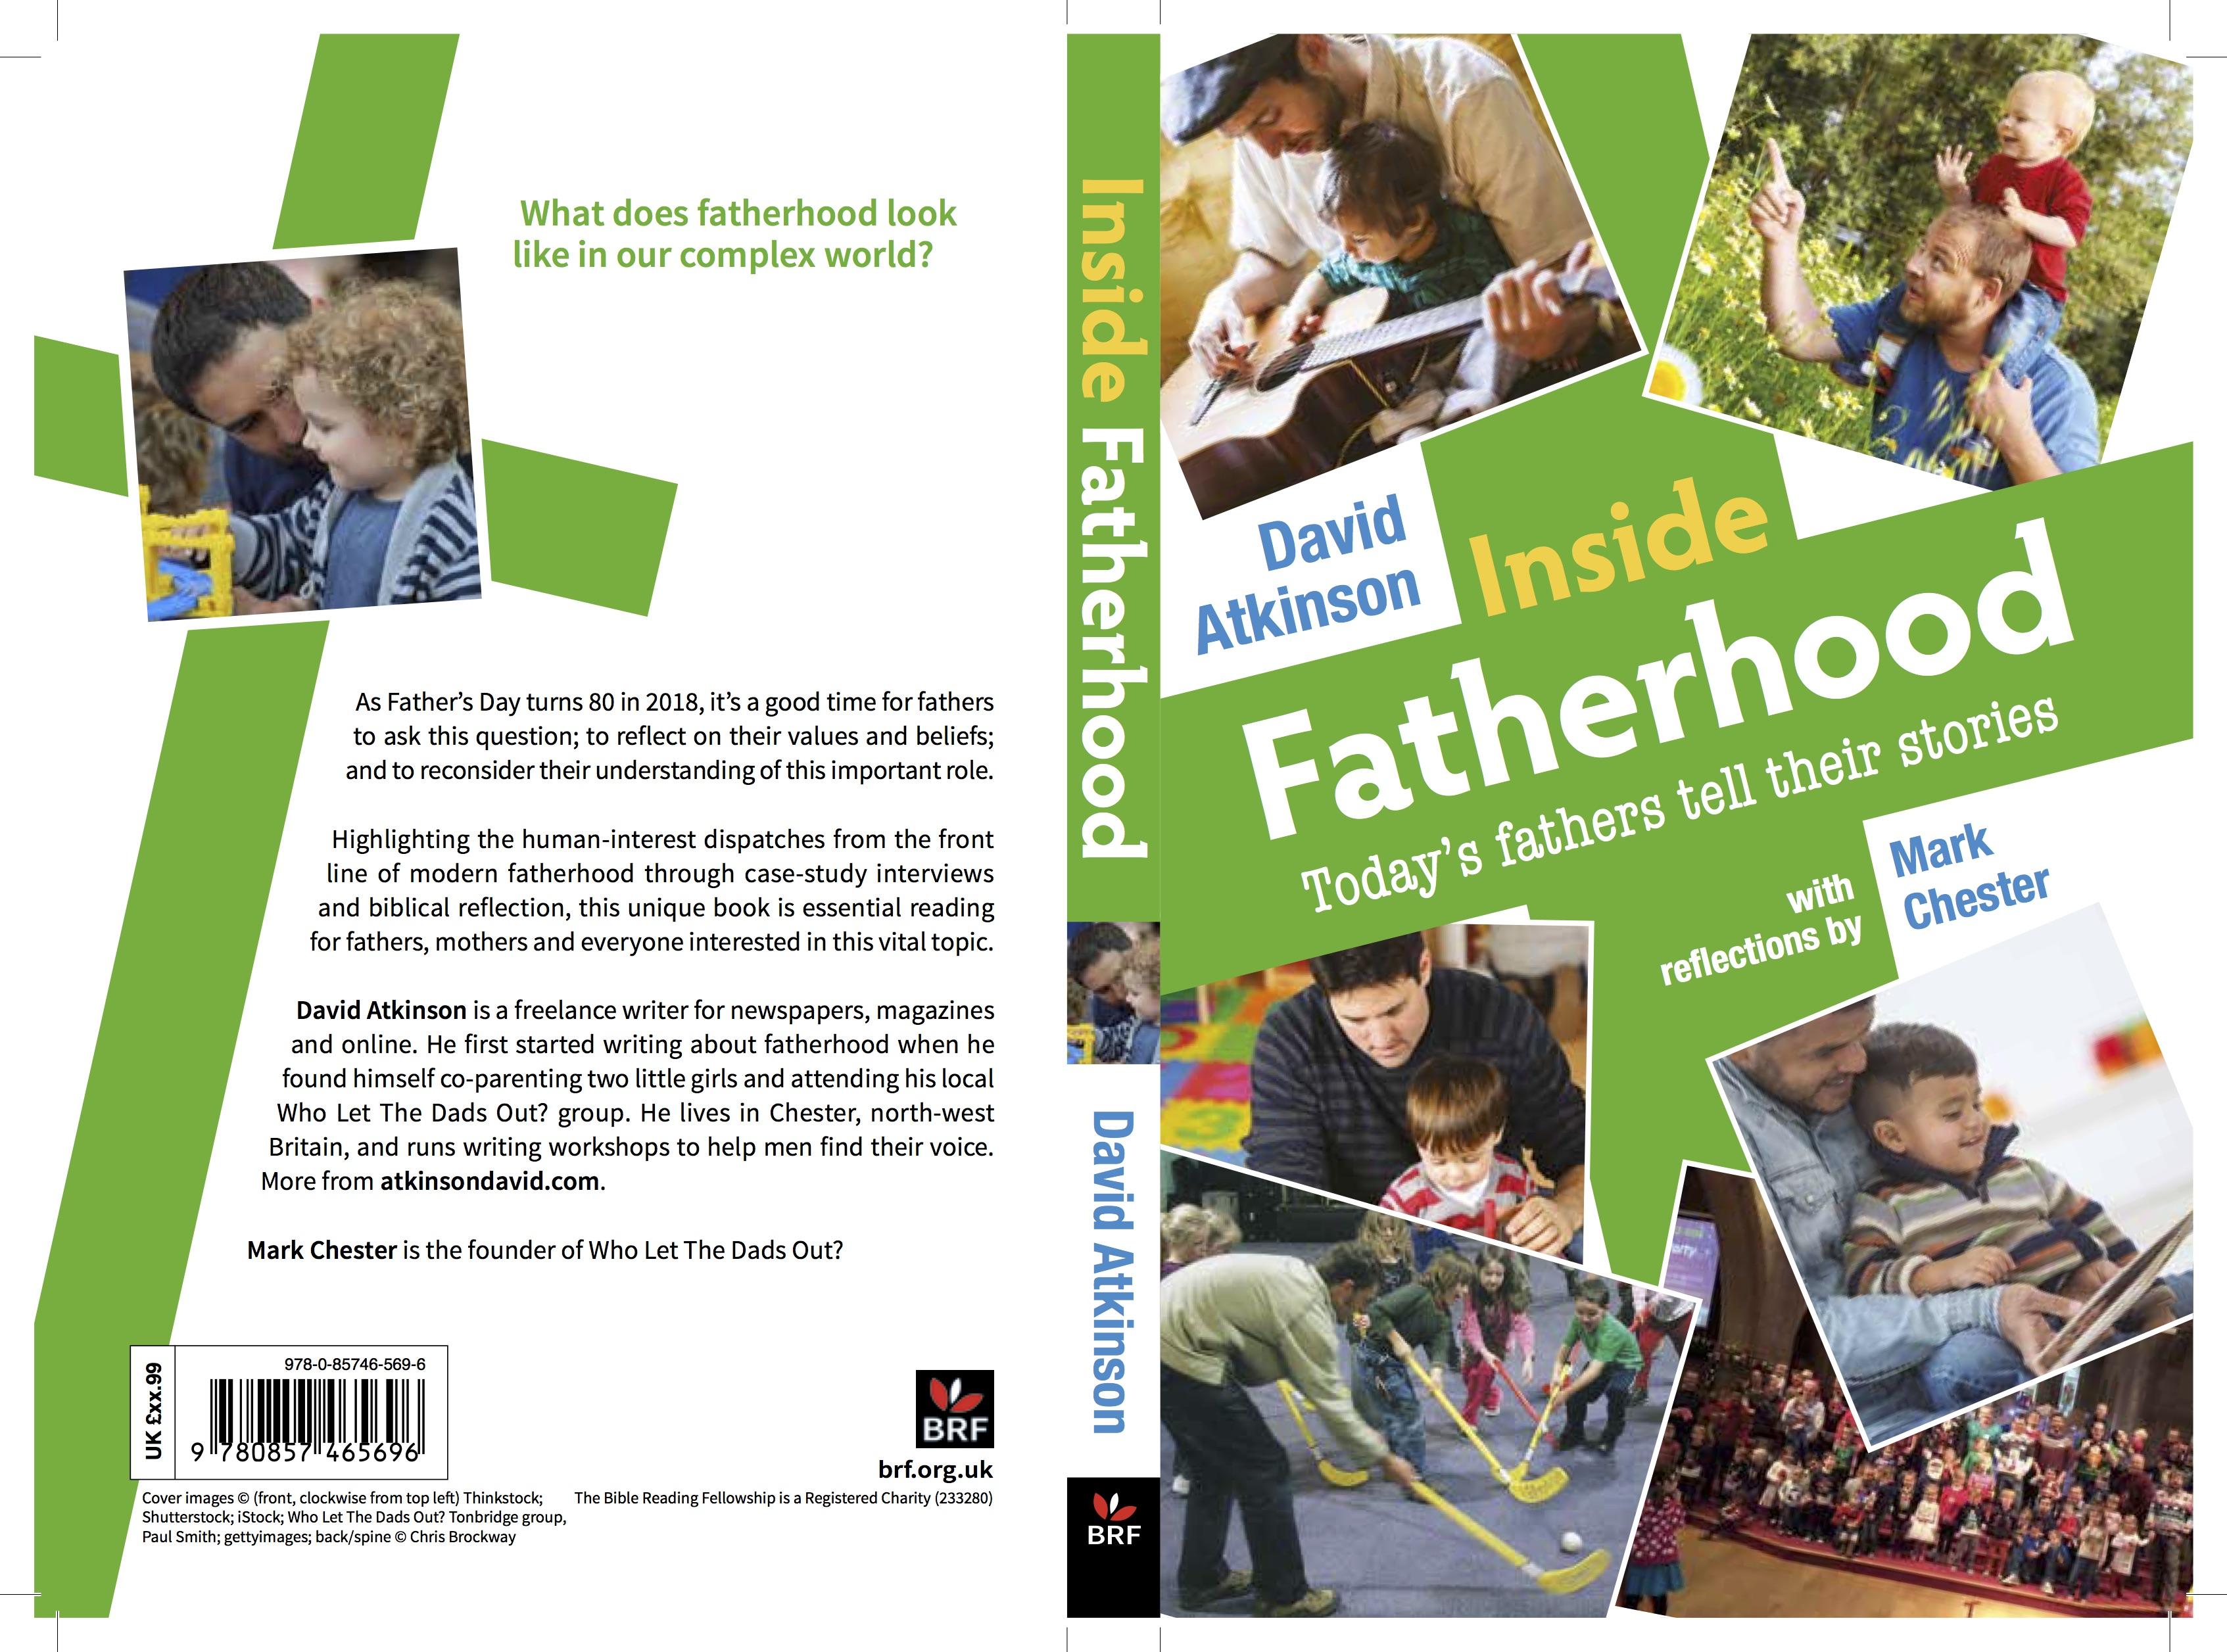 Inside Fatherhood Archives - Page 2 of 2 - David Atkinson